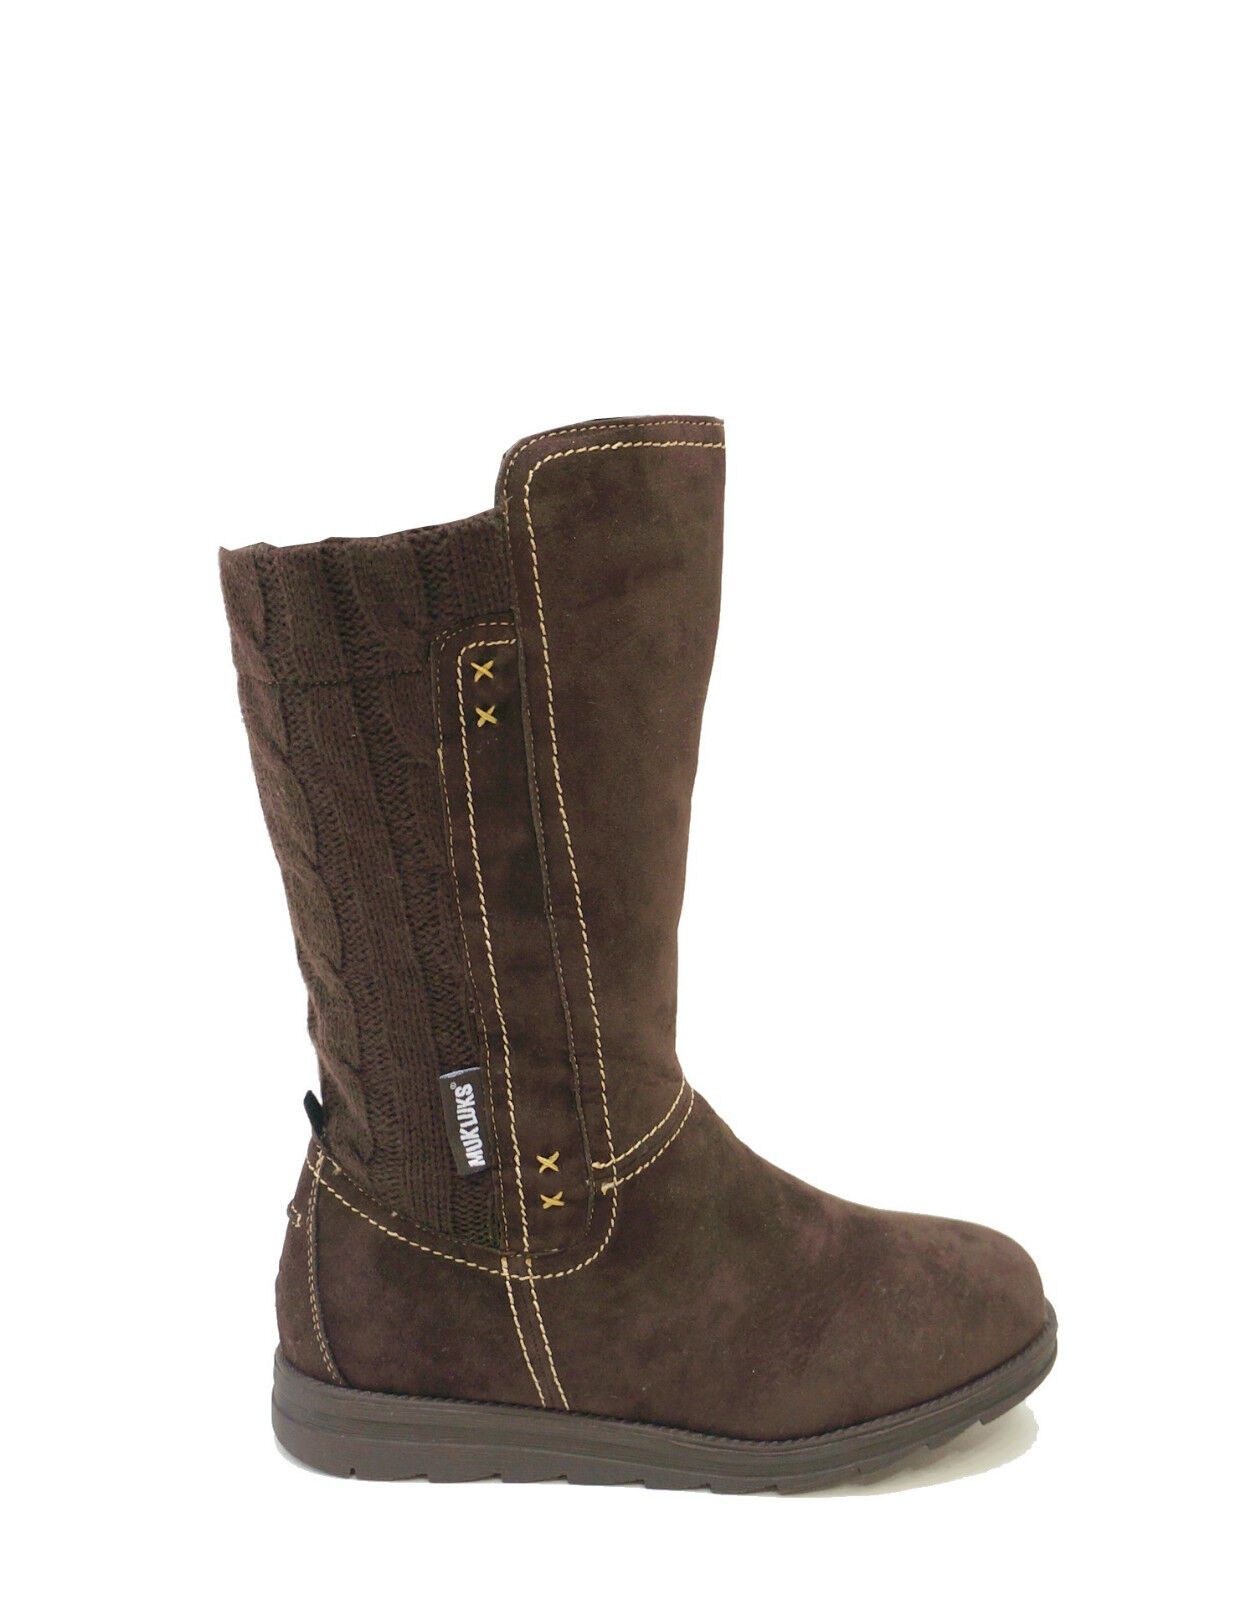 Muk Luks Brown Water Resistant Mid Calf Boots Stacy Women's US 6